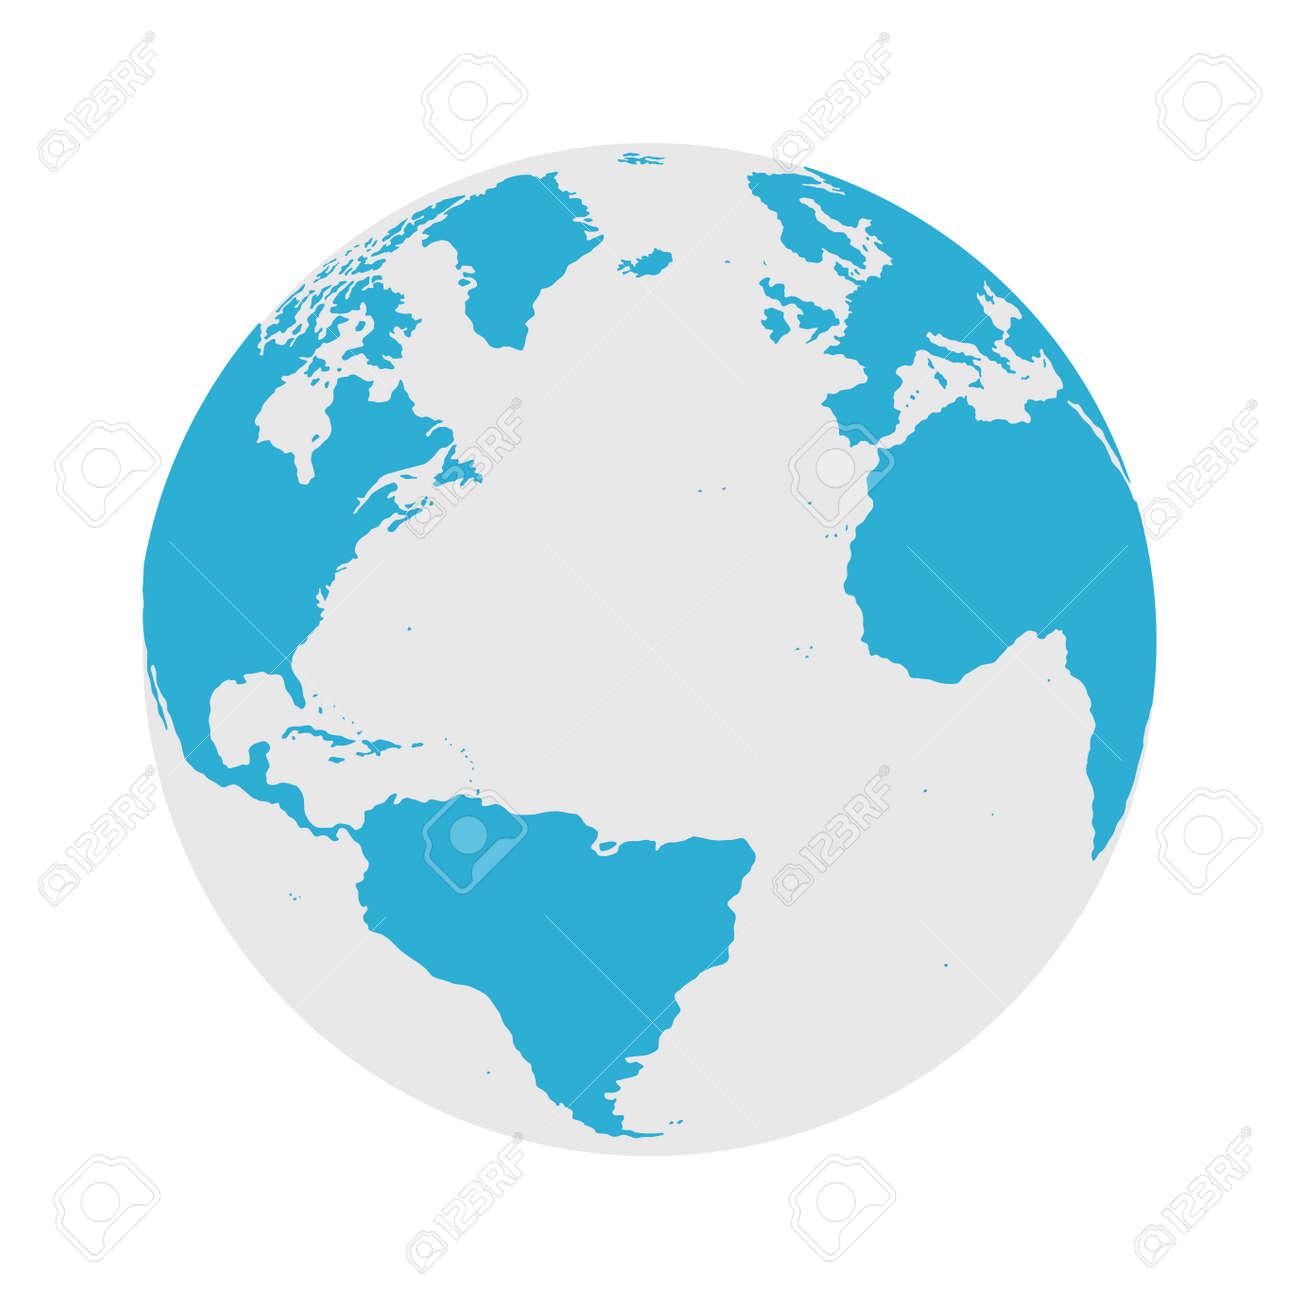 Globe Icon - Round World Map Flat Vector Illustration - 125586056